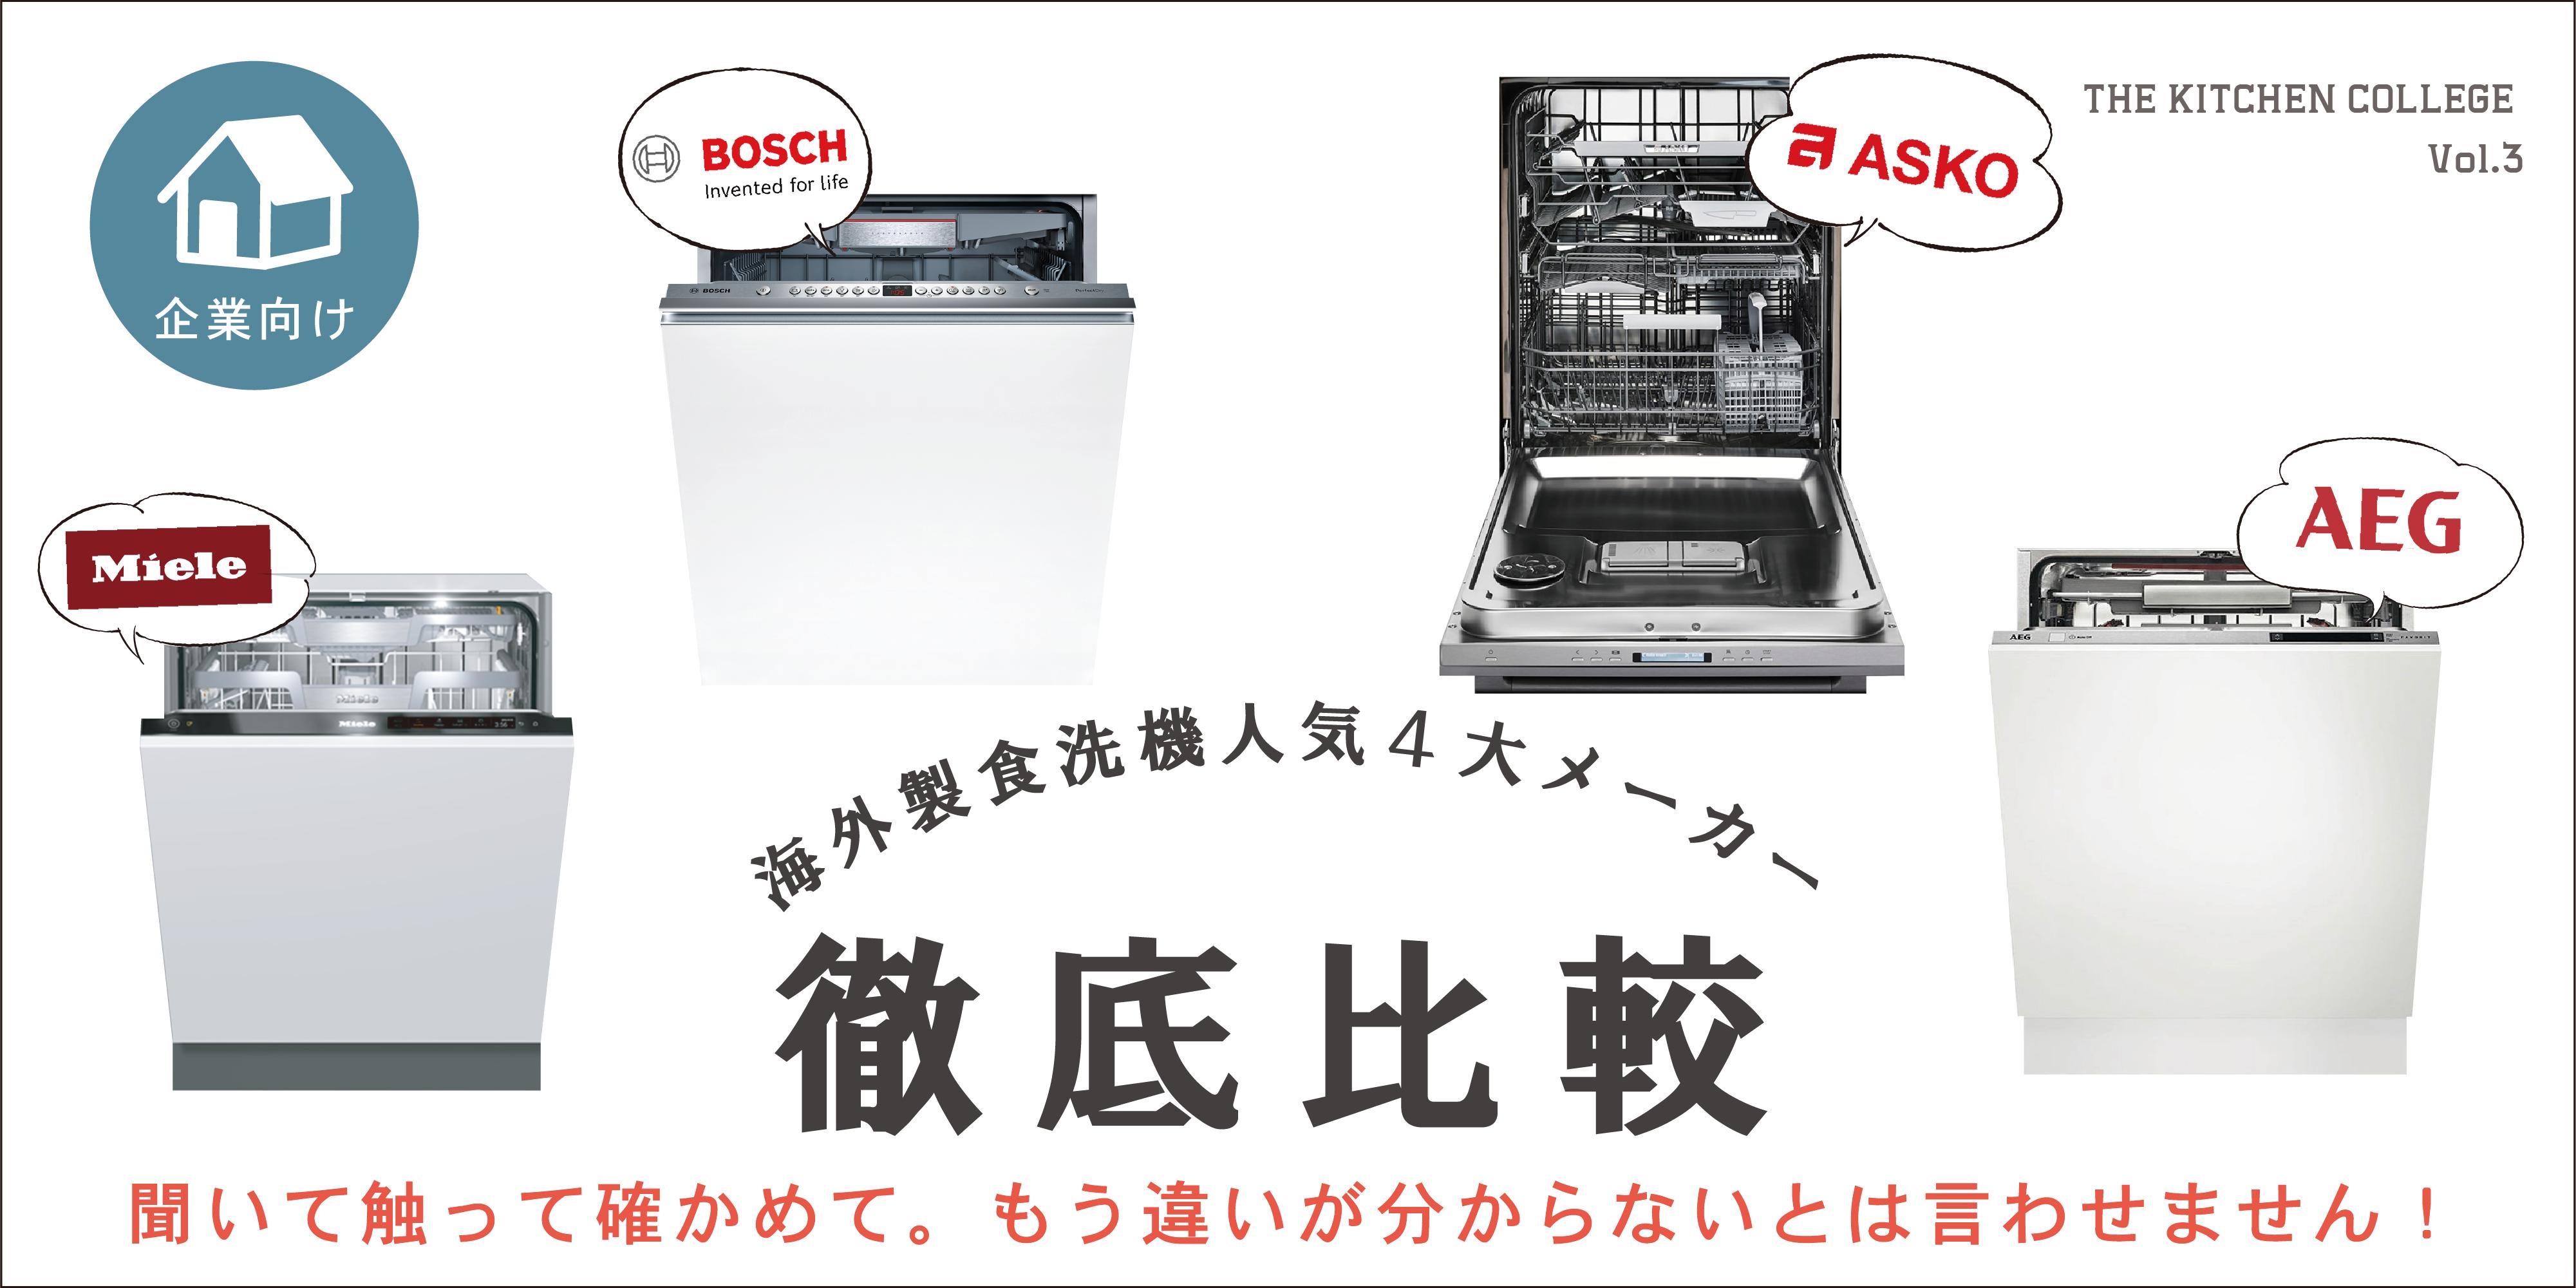 THE KITCHEN COLLEGE vol.3 -海外製食洗機人気4大メーカー徹底比較-